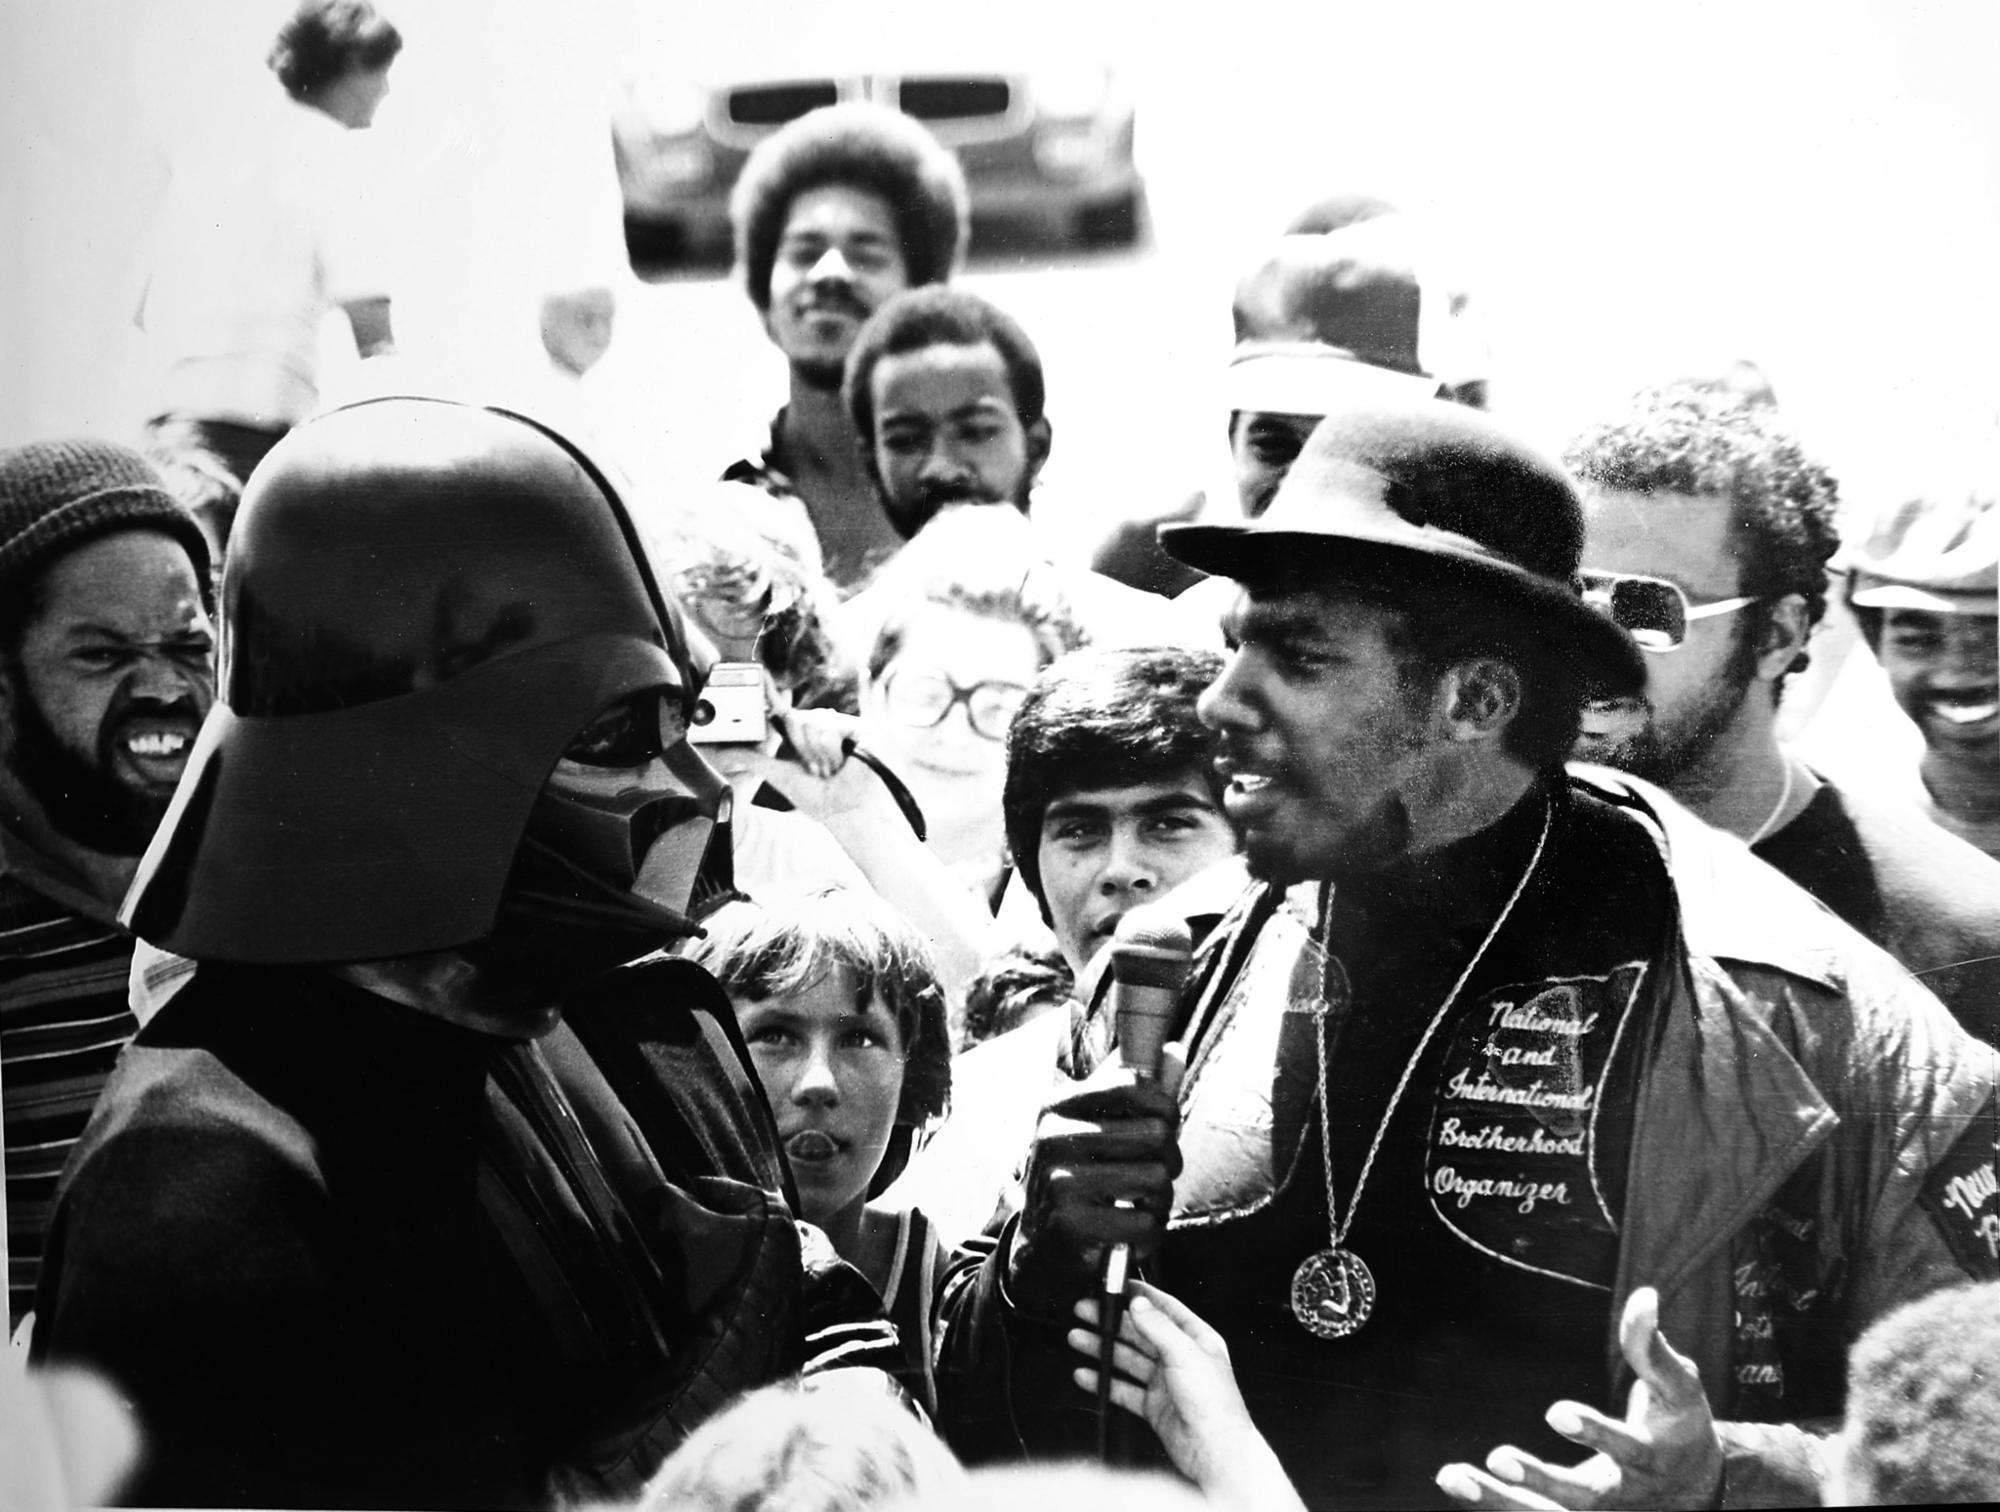 Darth Vader and Big Willie Robinson